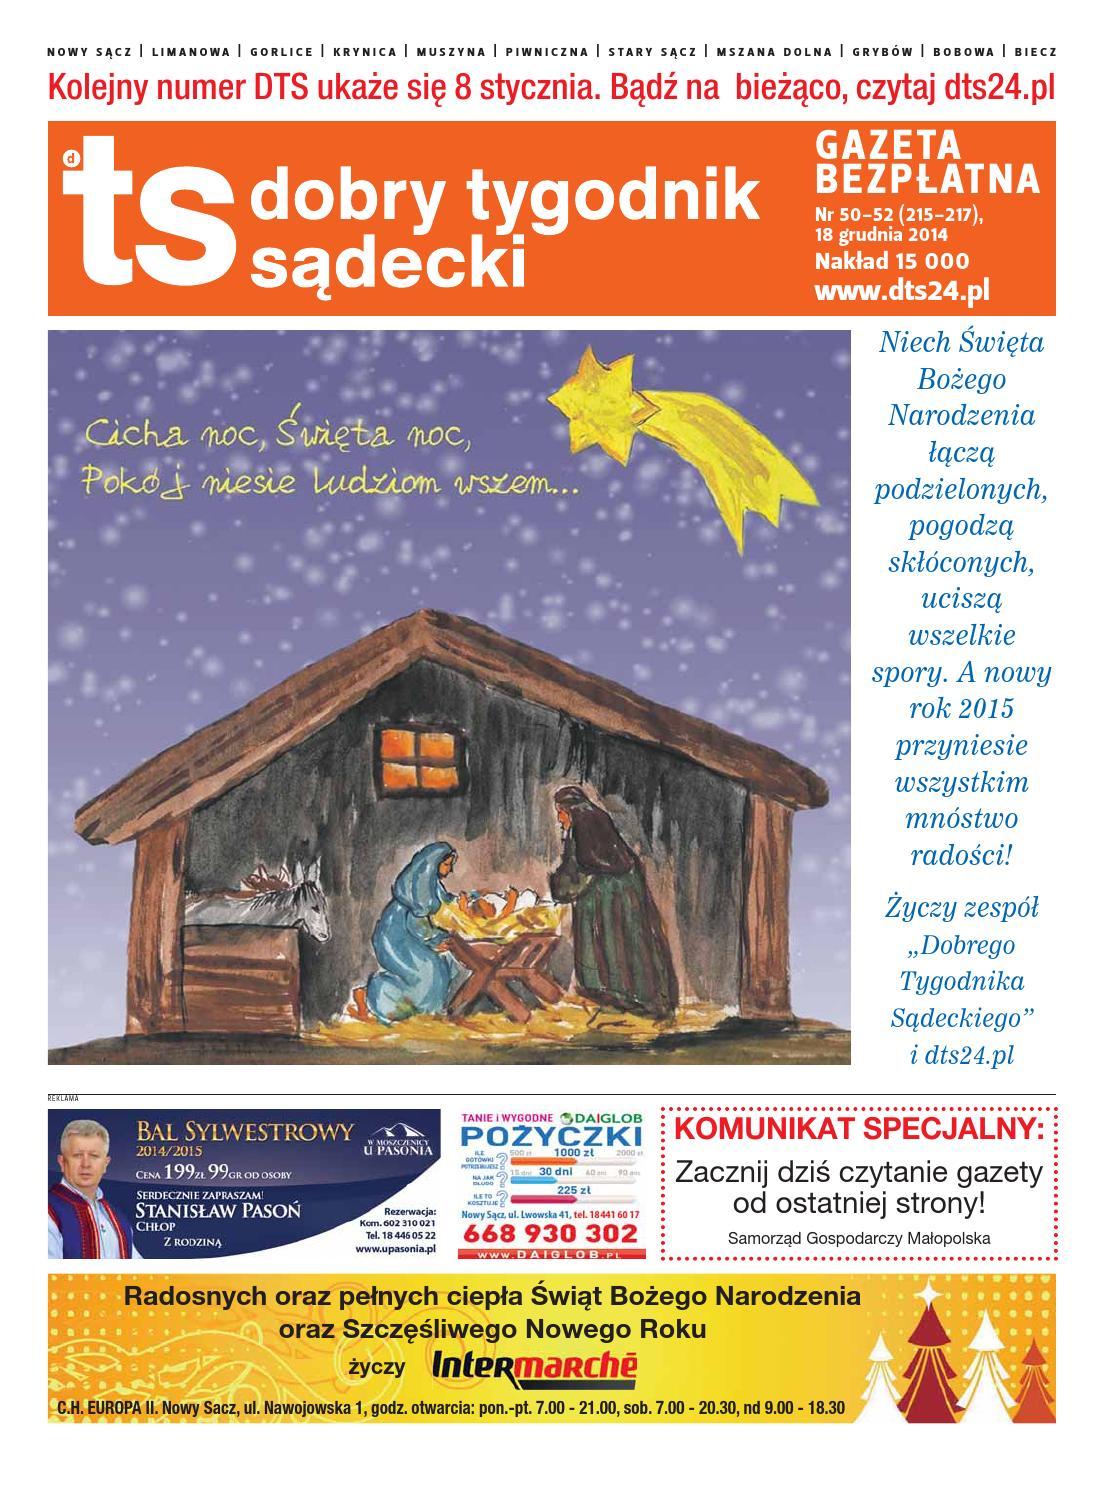 [maletas-harderback.com] Jestem homo - Tygodnik Podhalaski